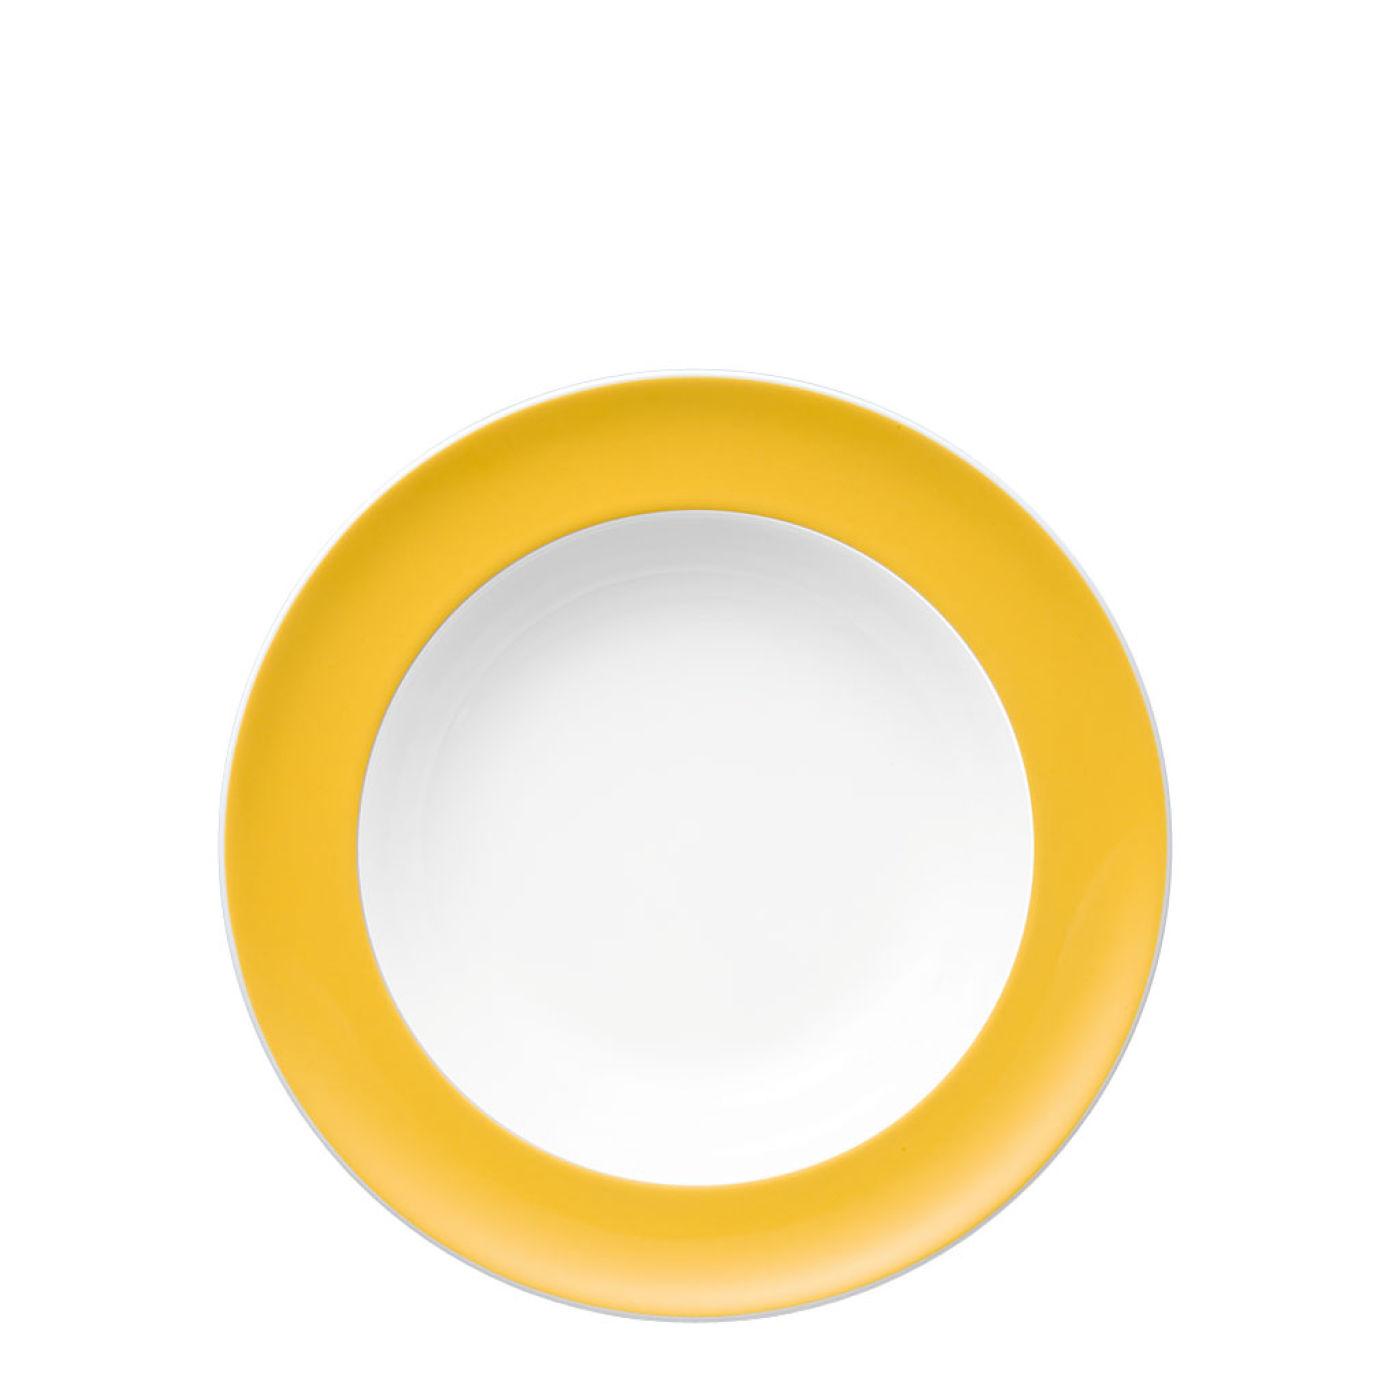 Тарелка глубокая Rosenthal SUNNY DAY, диаметр 23 см, желтый Rosenthal 70850-408502-10323 фото 1